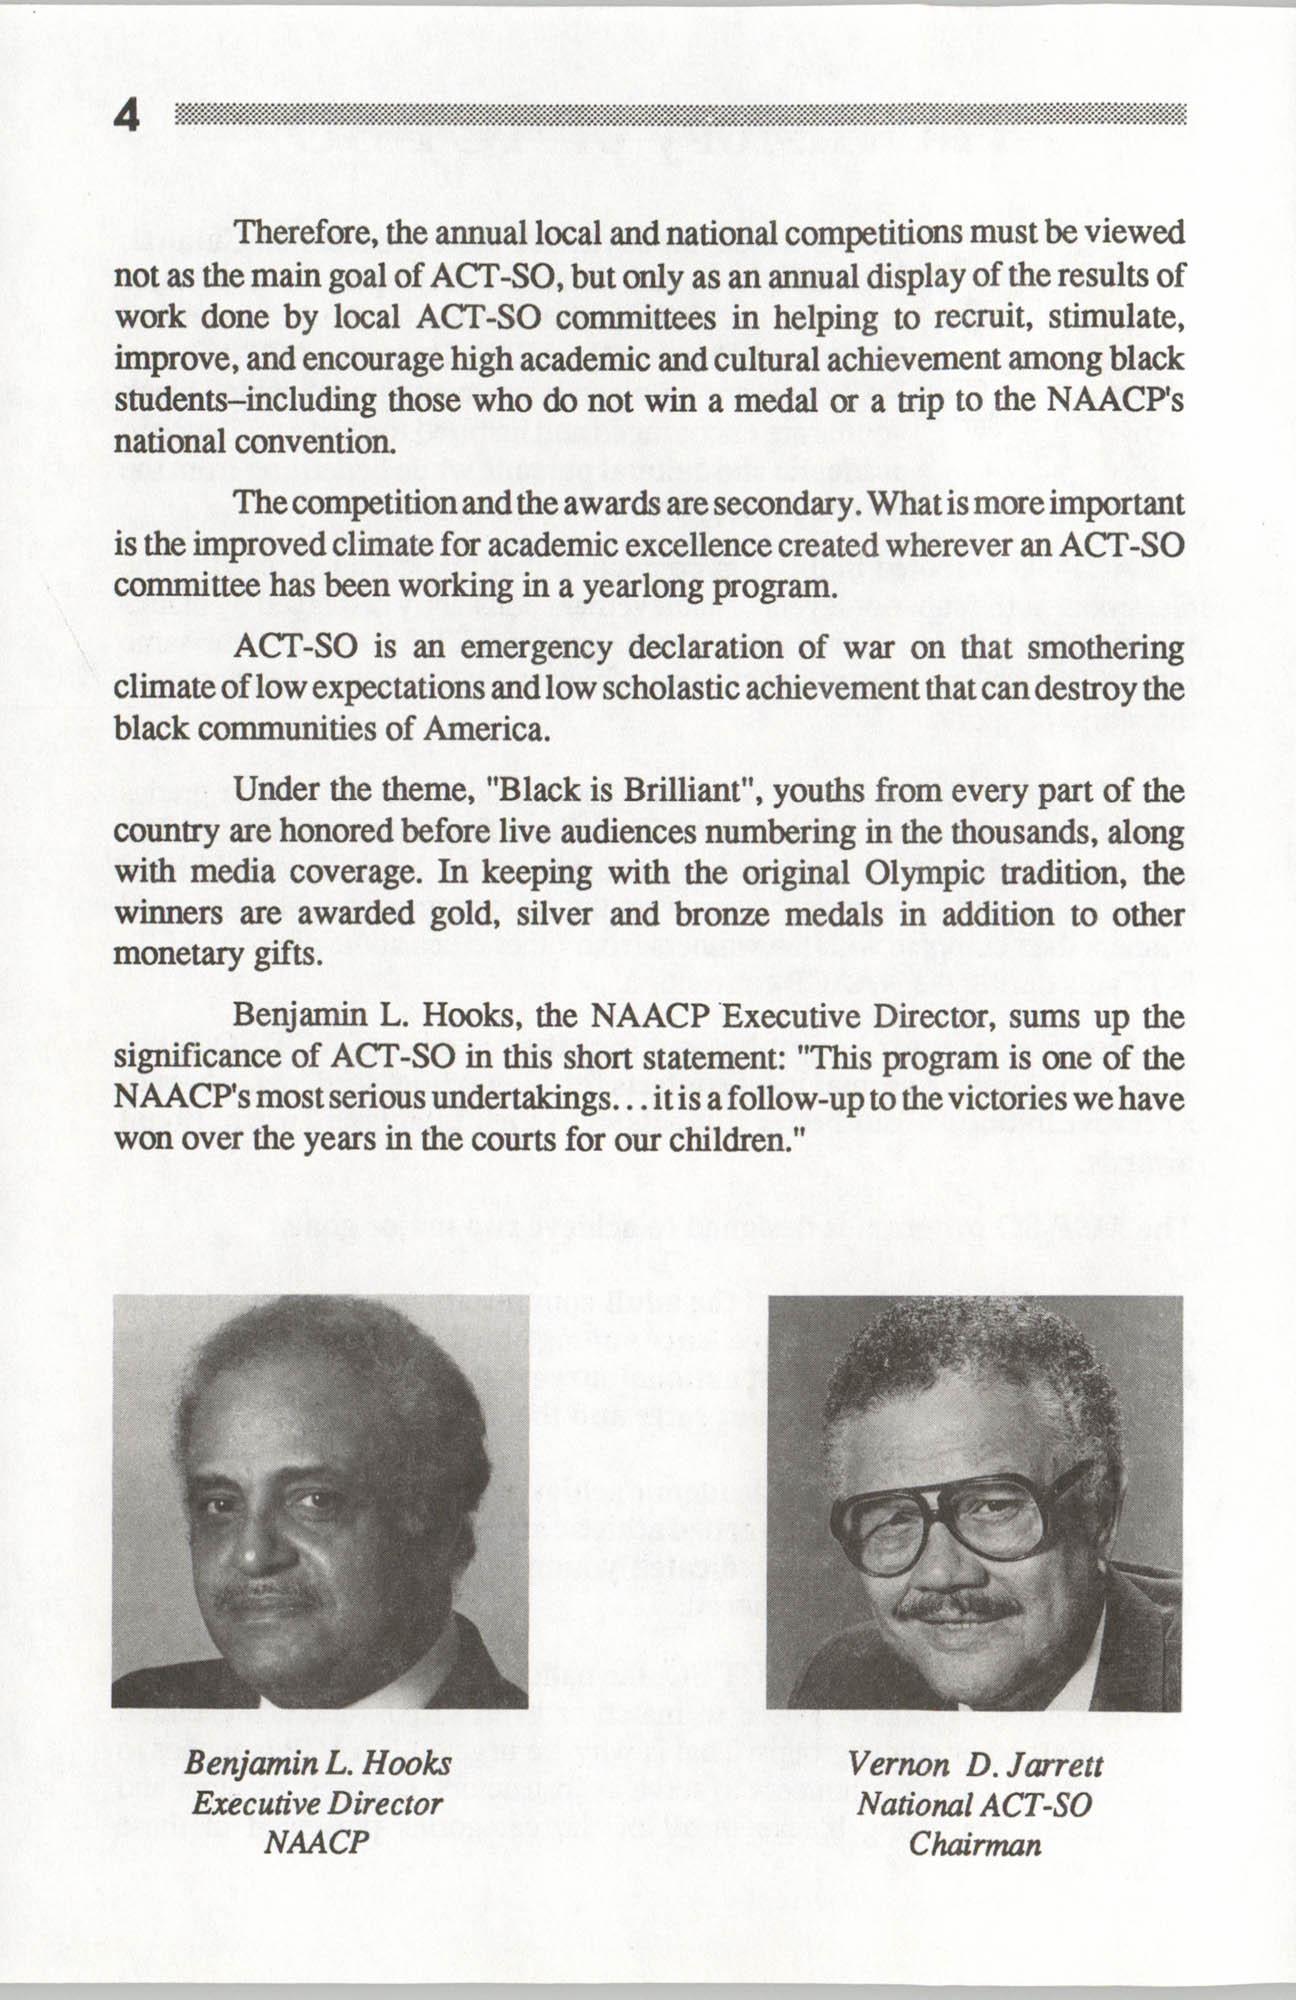 Brochure, ACT-SO Program, NAACP, 1992, Page 4